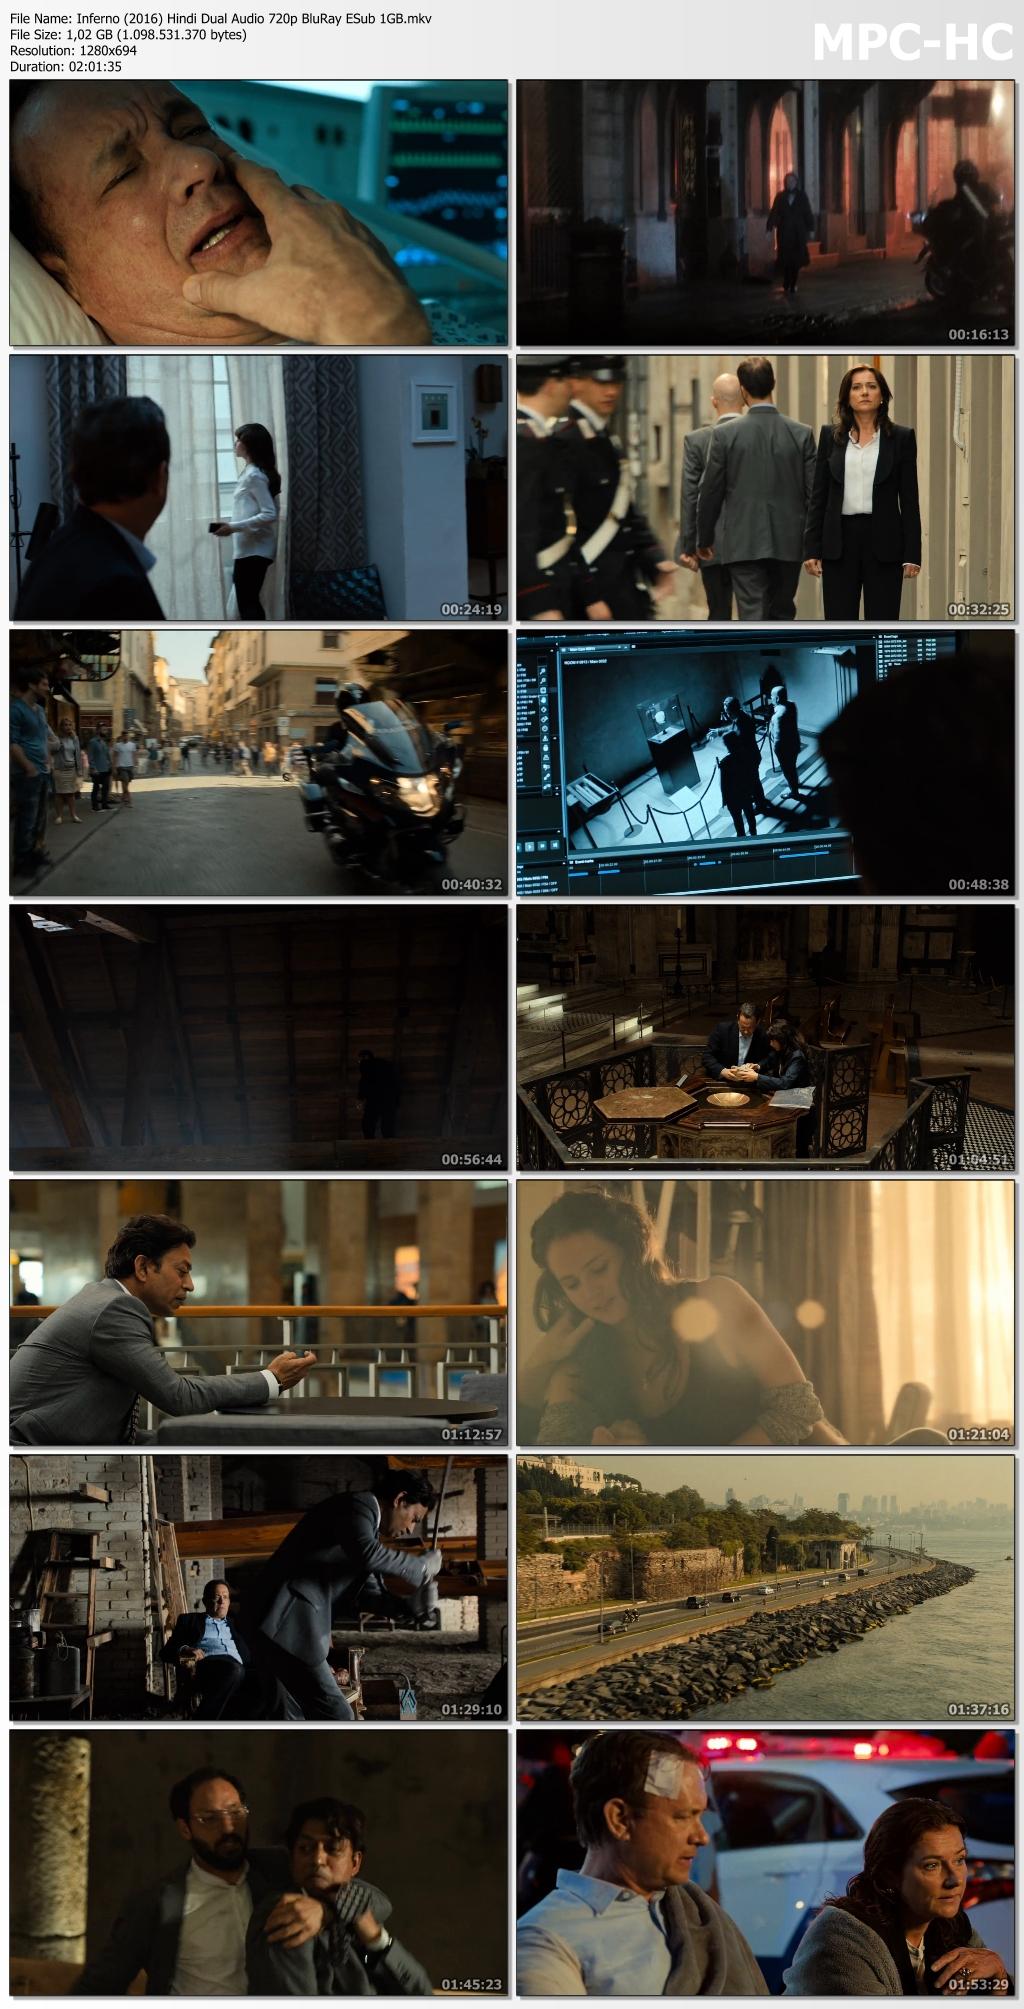 Inferno-2016-Hindi-Dual-Audio-720p-Blu-Ray-ESub-1-GB-mkv-thumbs